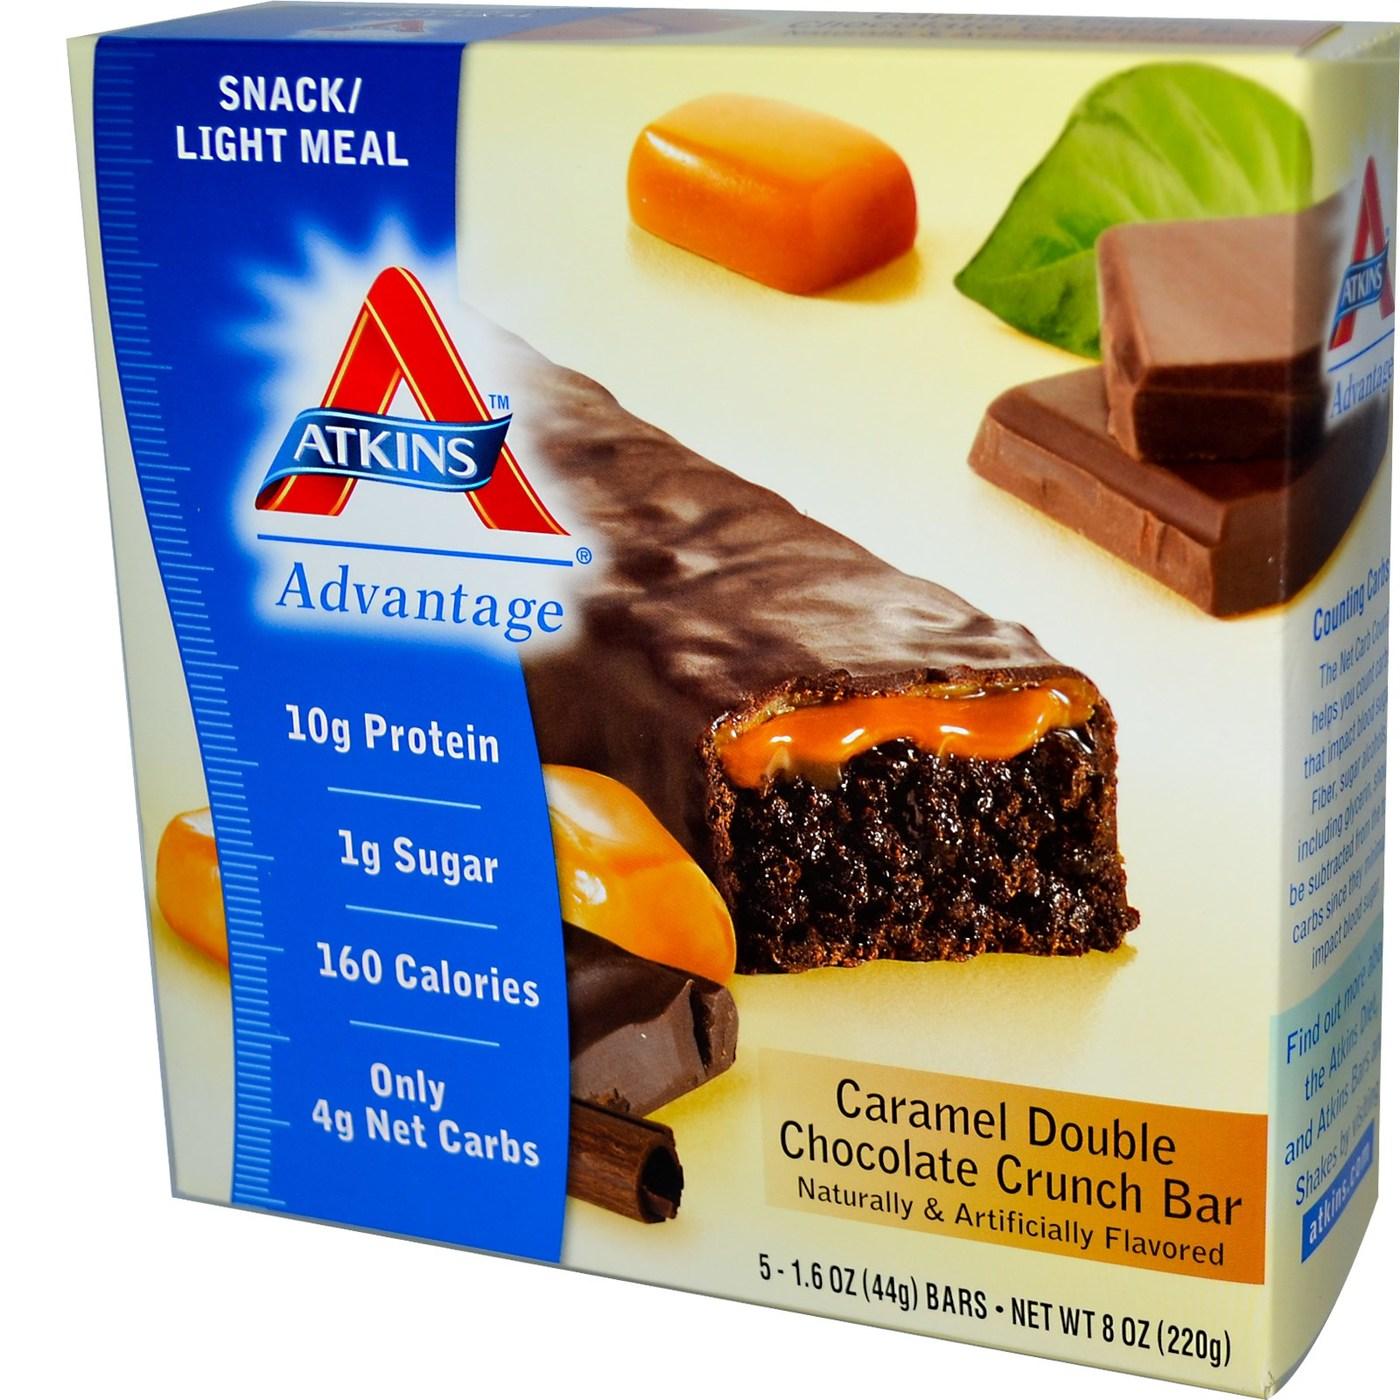 Atkins Caramel Double Chocolate Crunch Bar Review